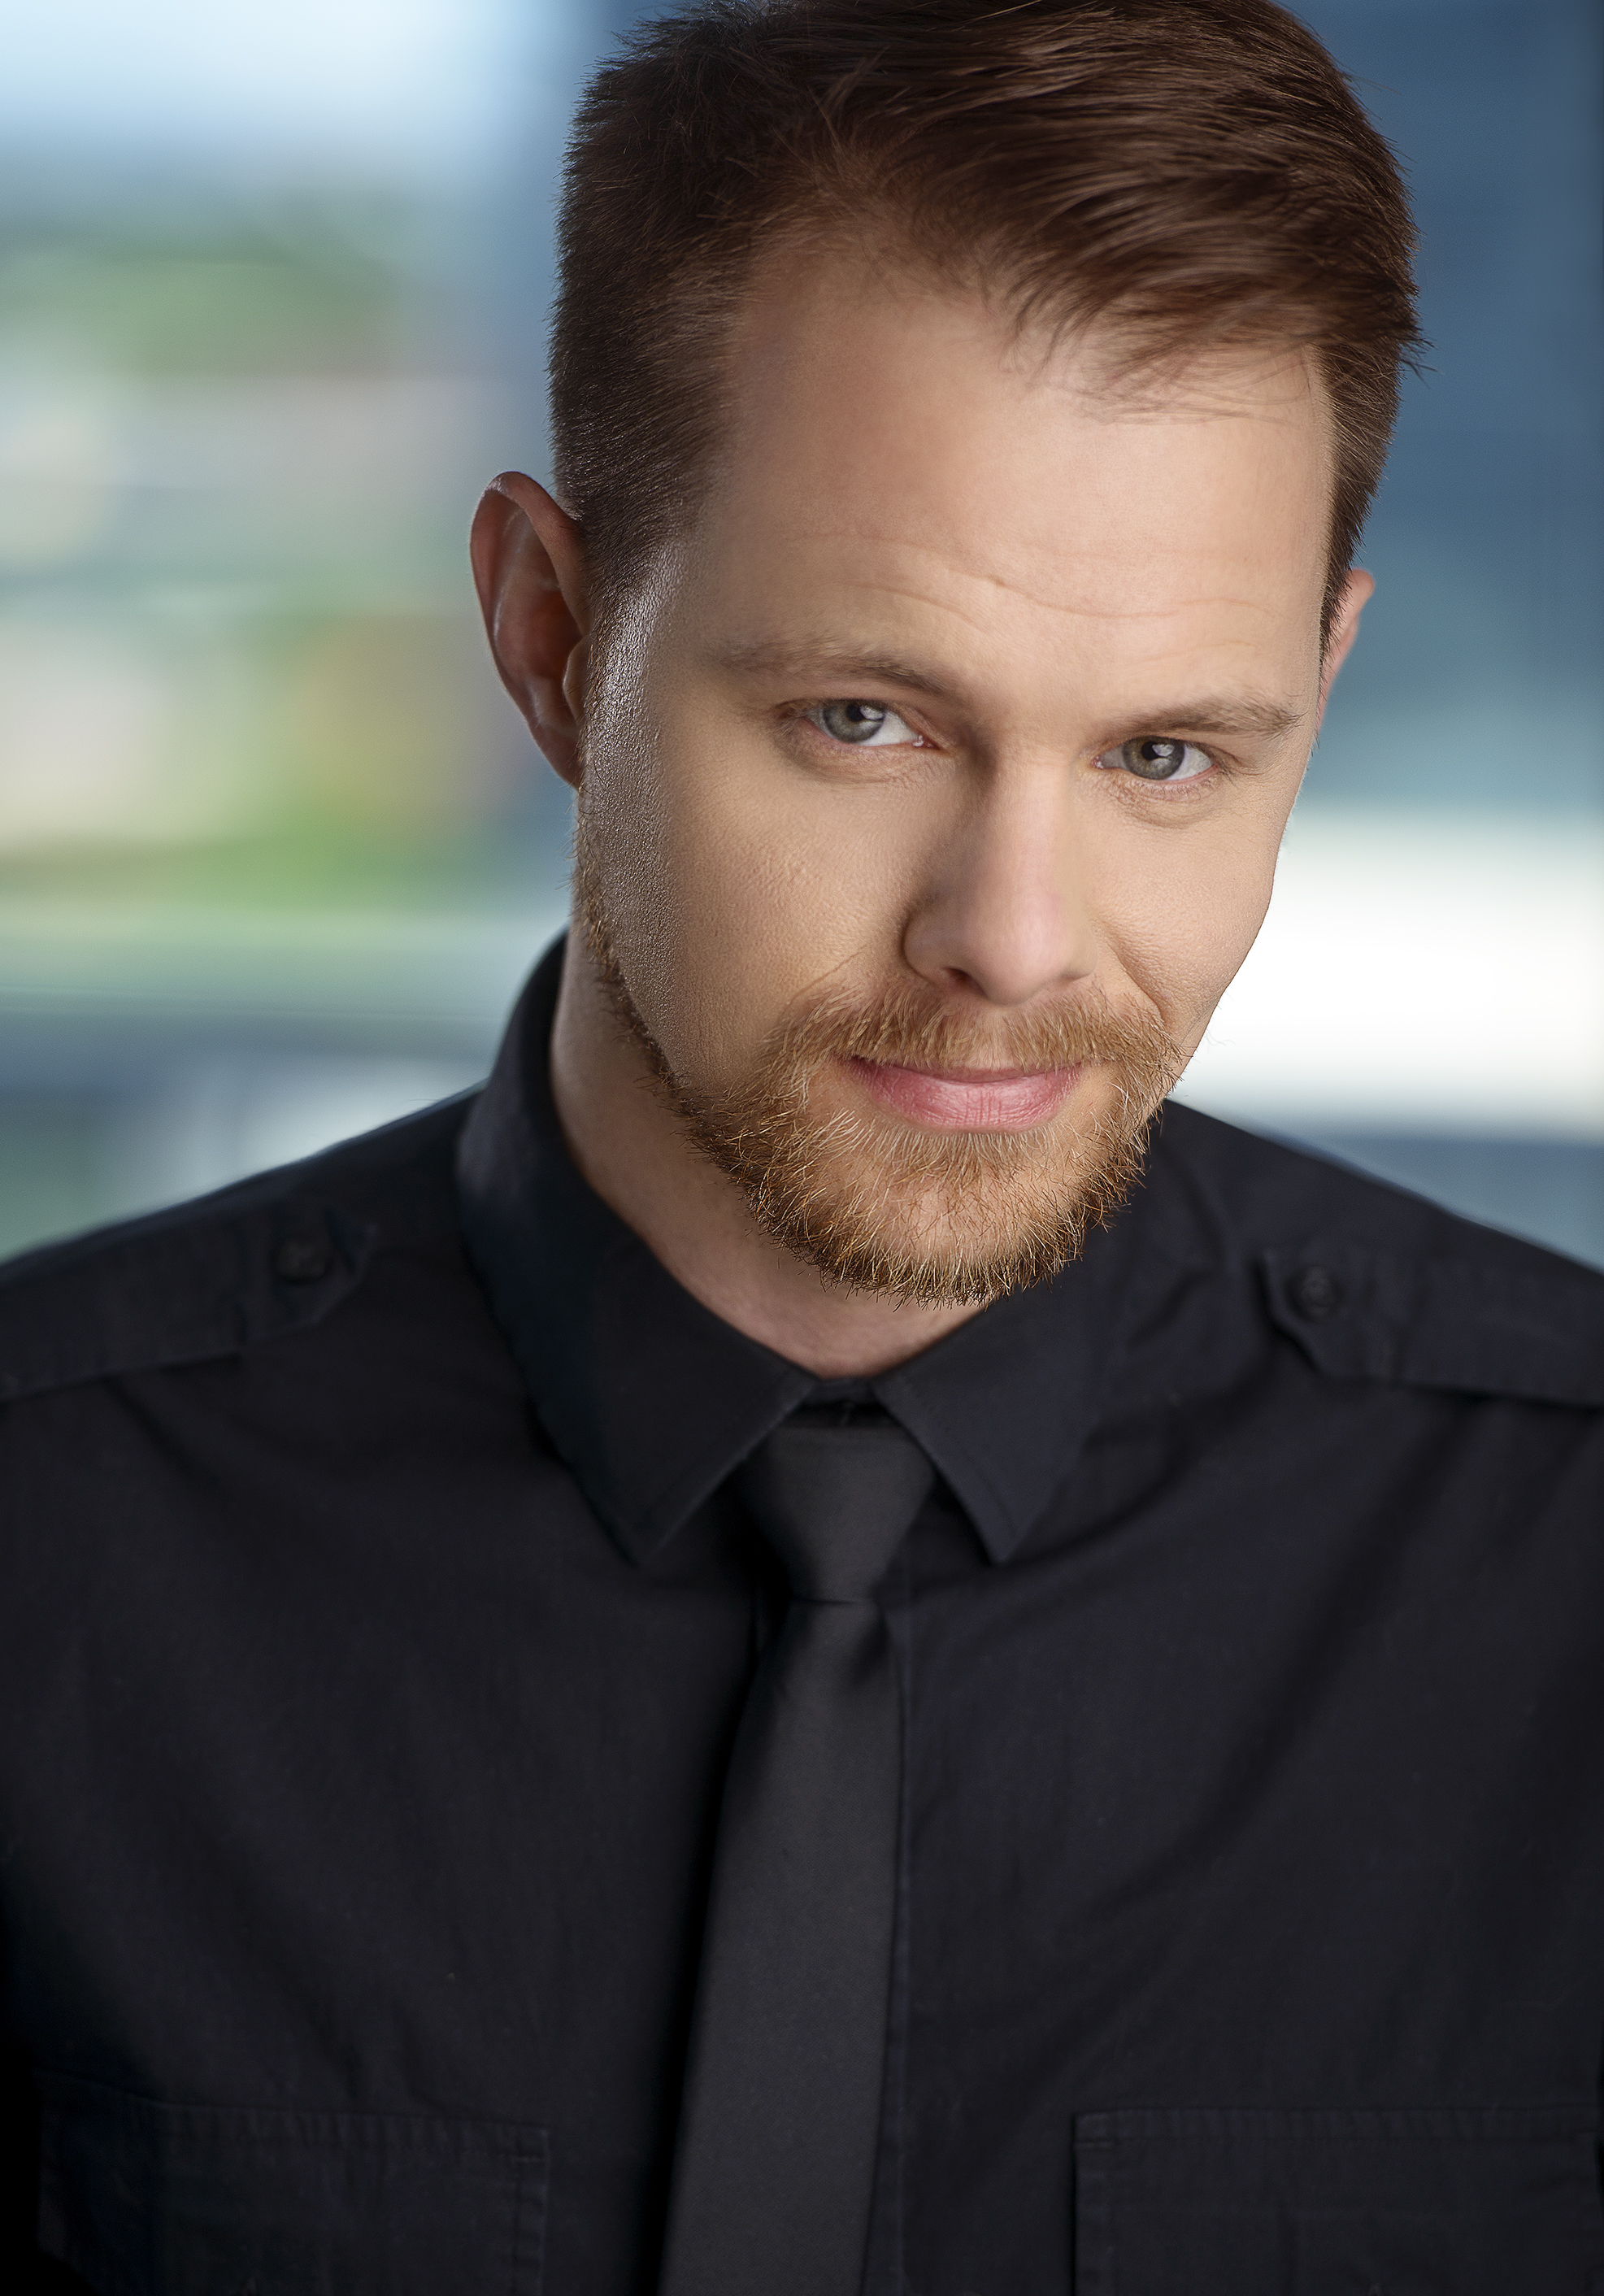 Bryan McClure